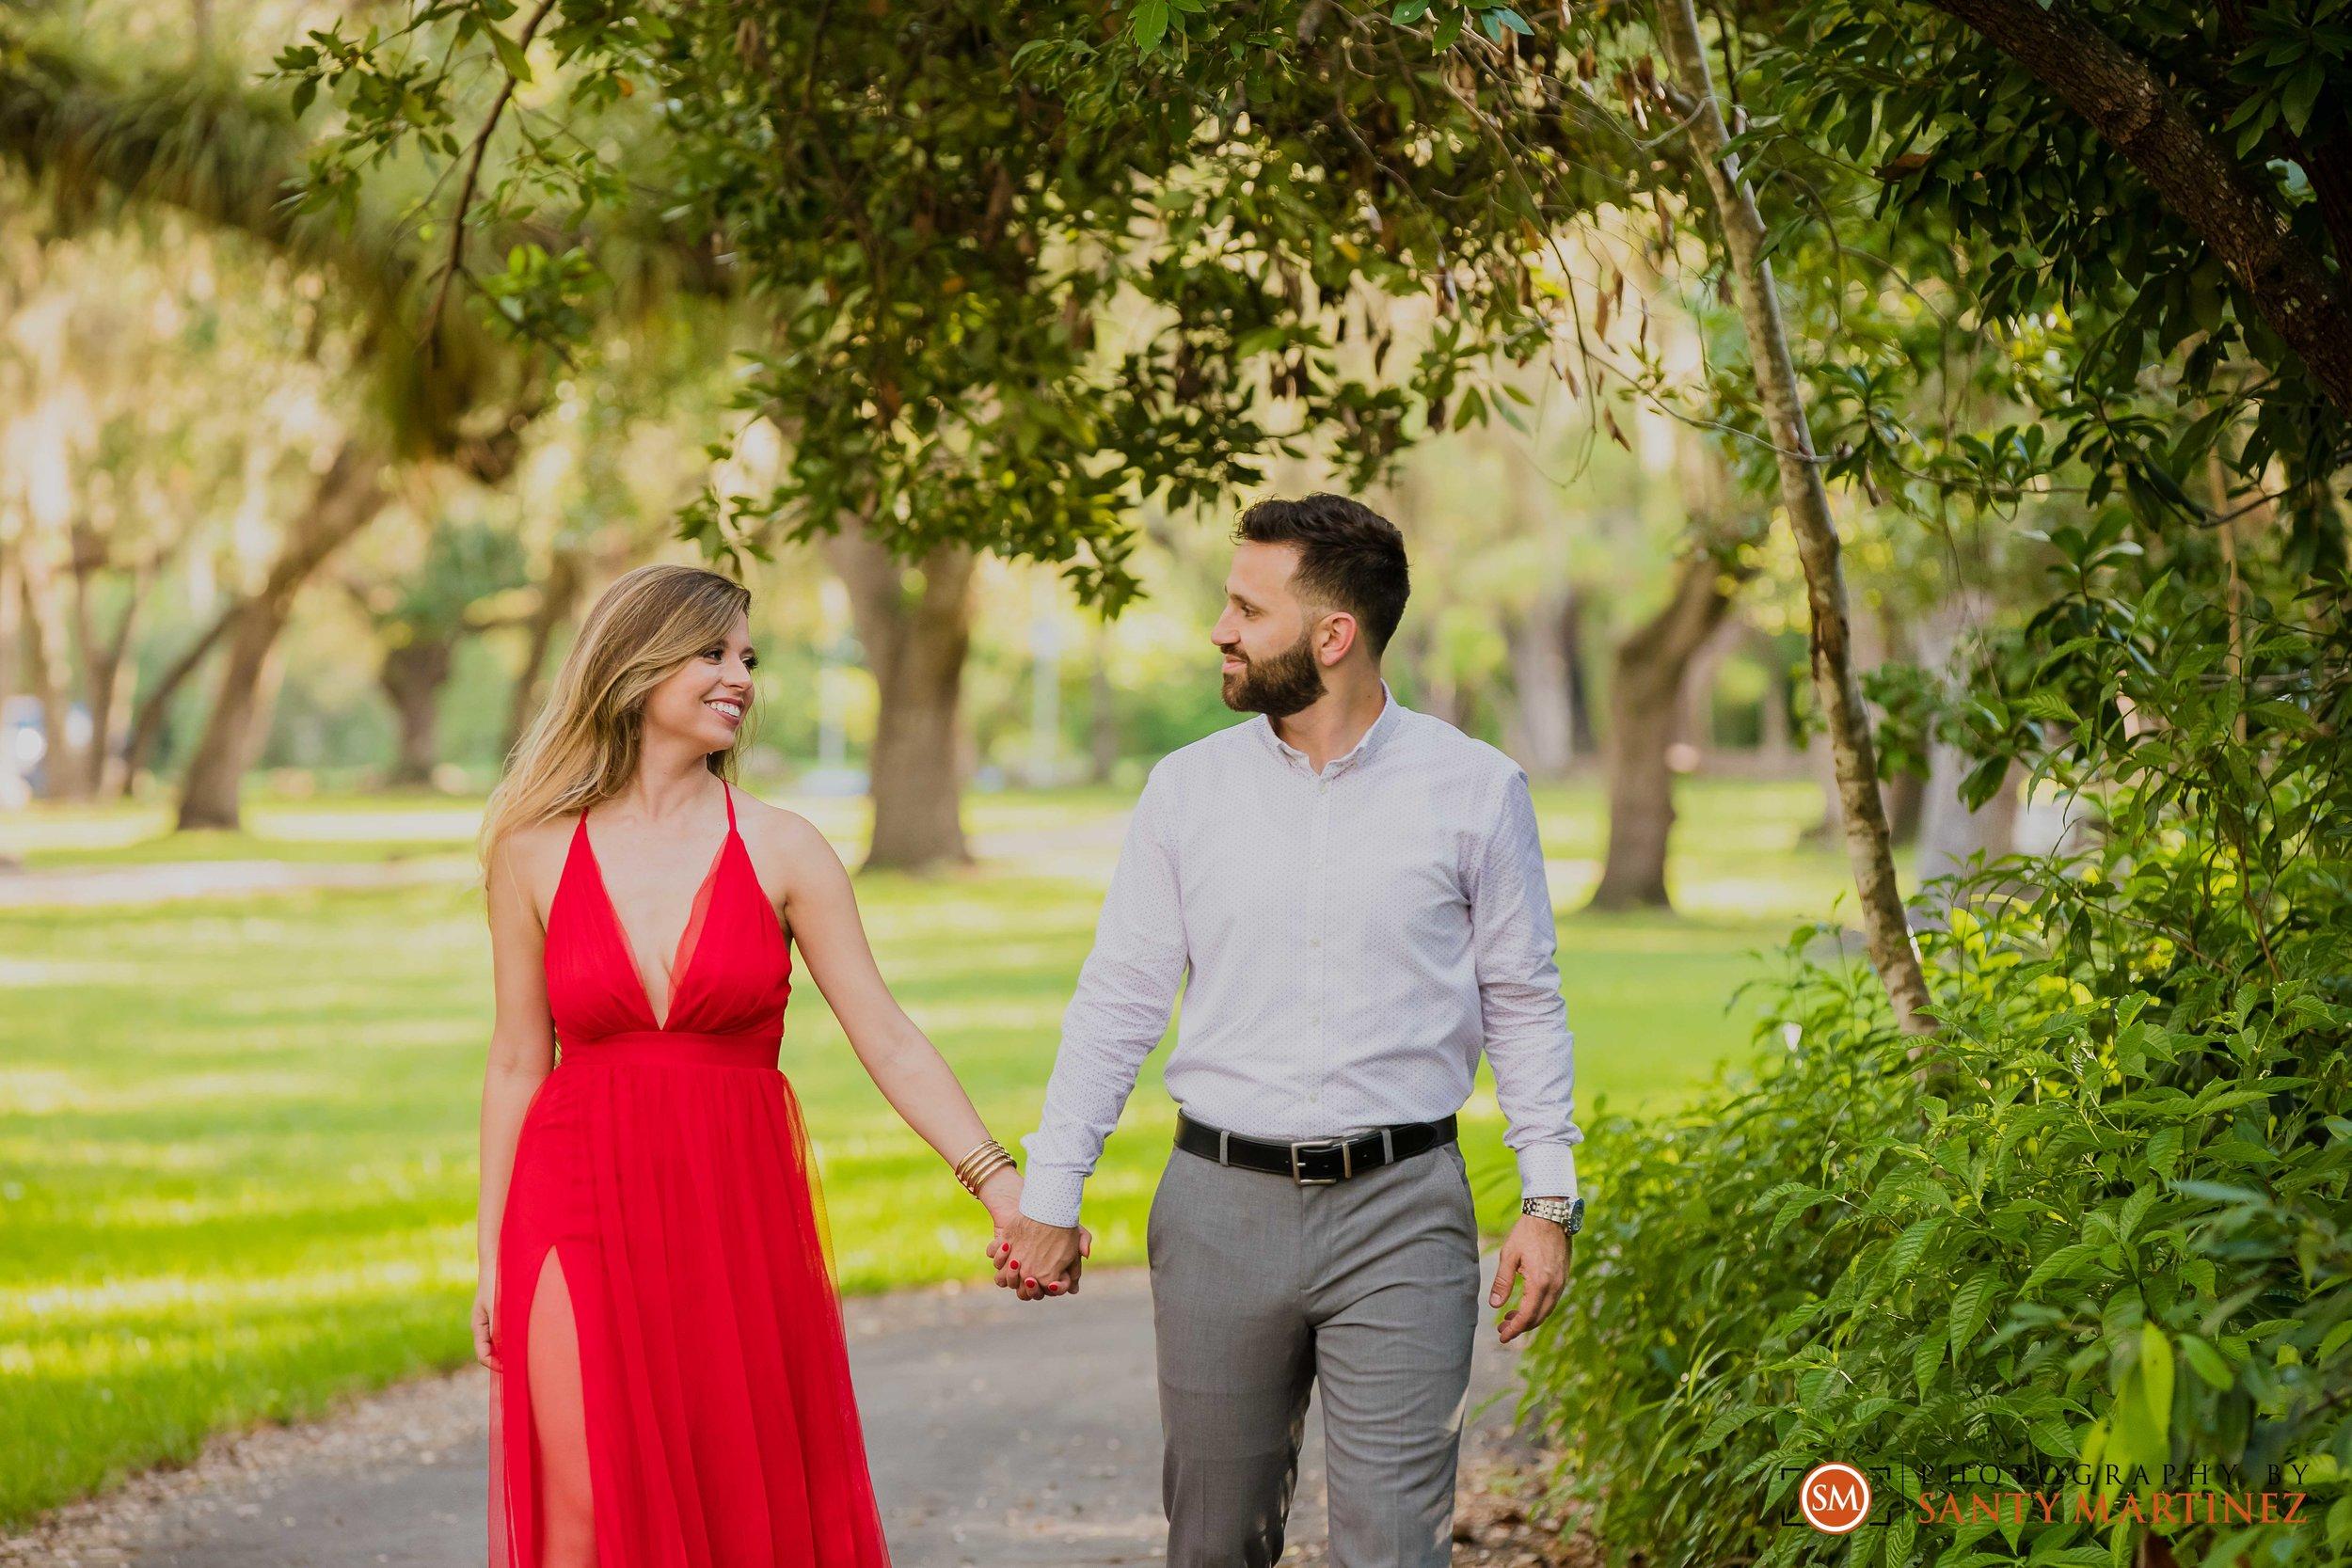 Engagement Session - Matheson Hammock Park - Santy Martinez Wedding Photographer-4.jpg